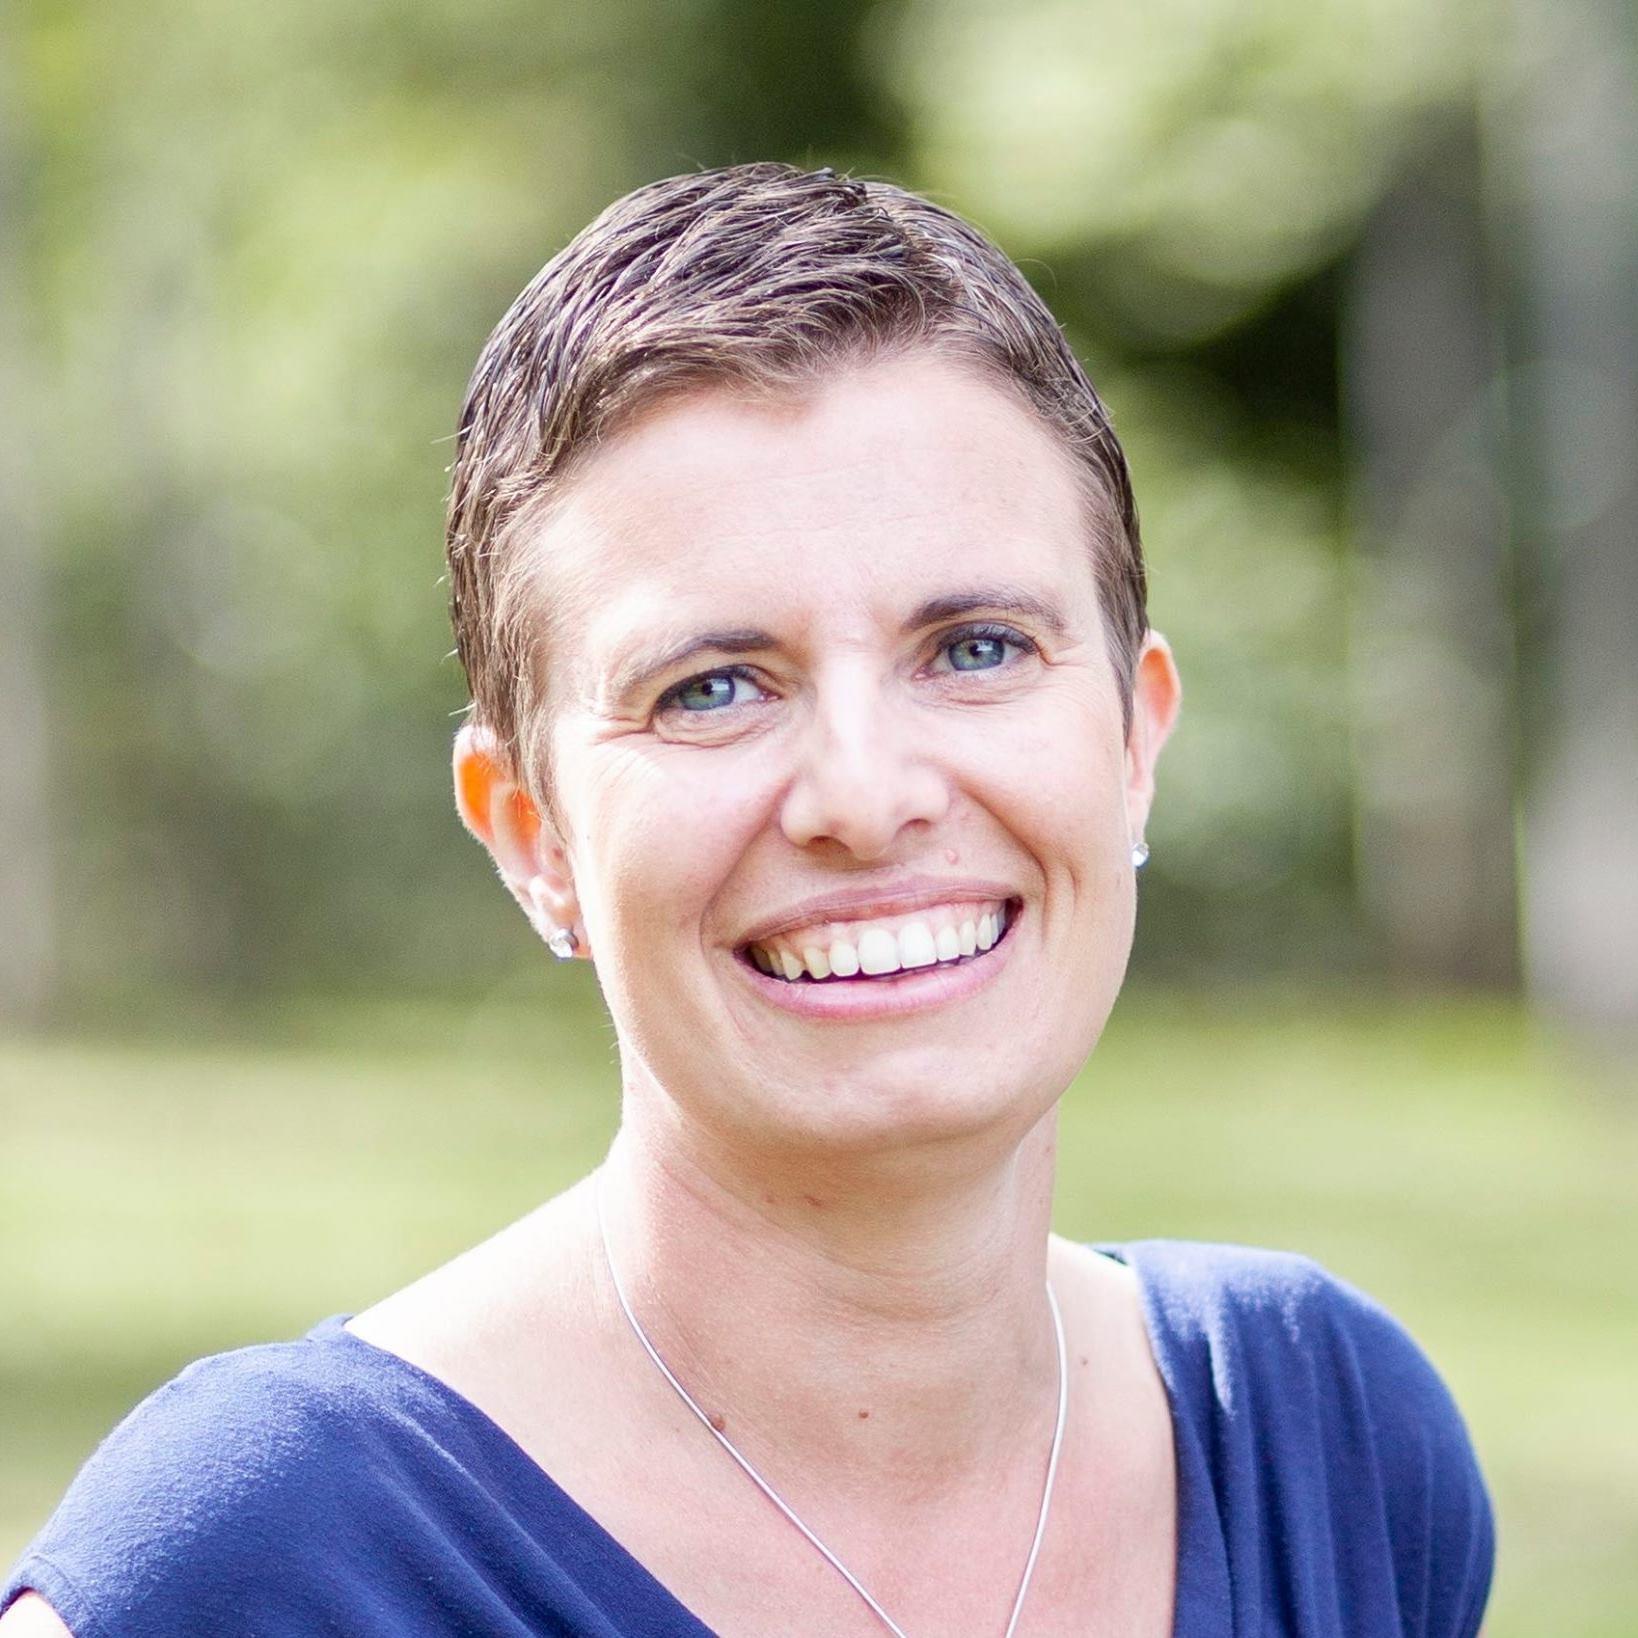 Sandra Mannaerts